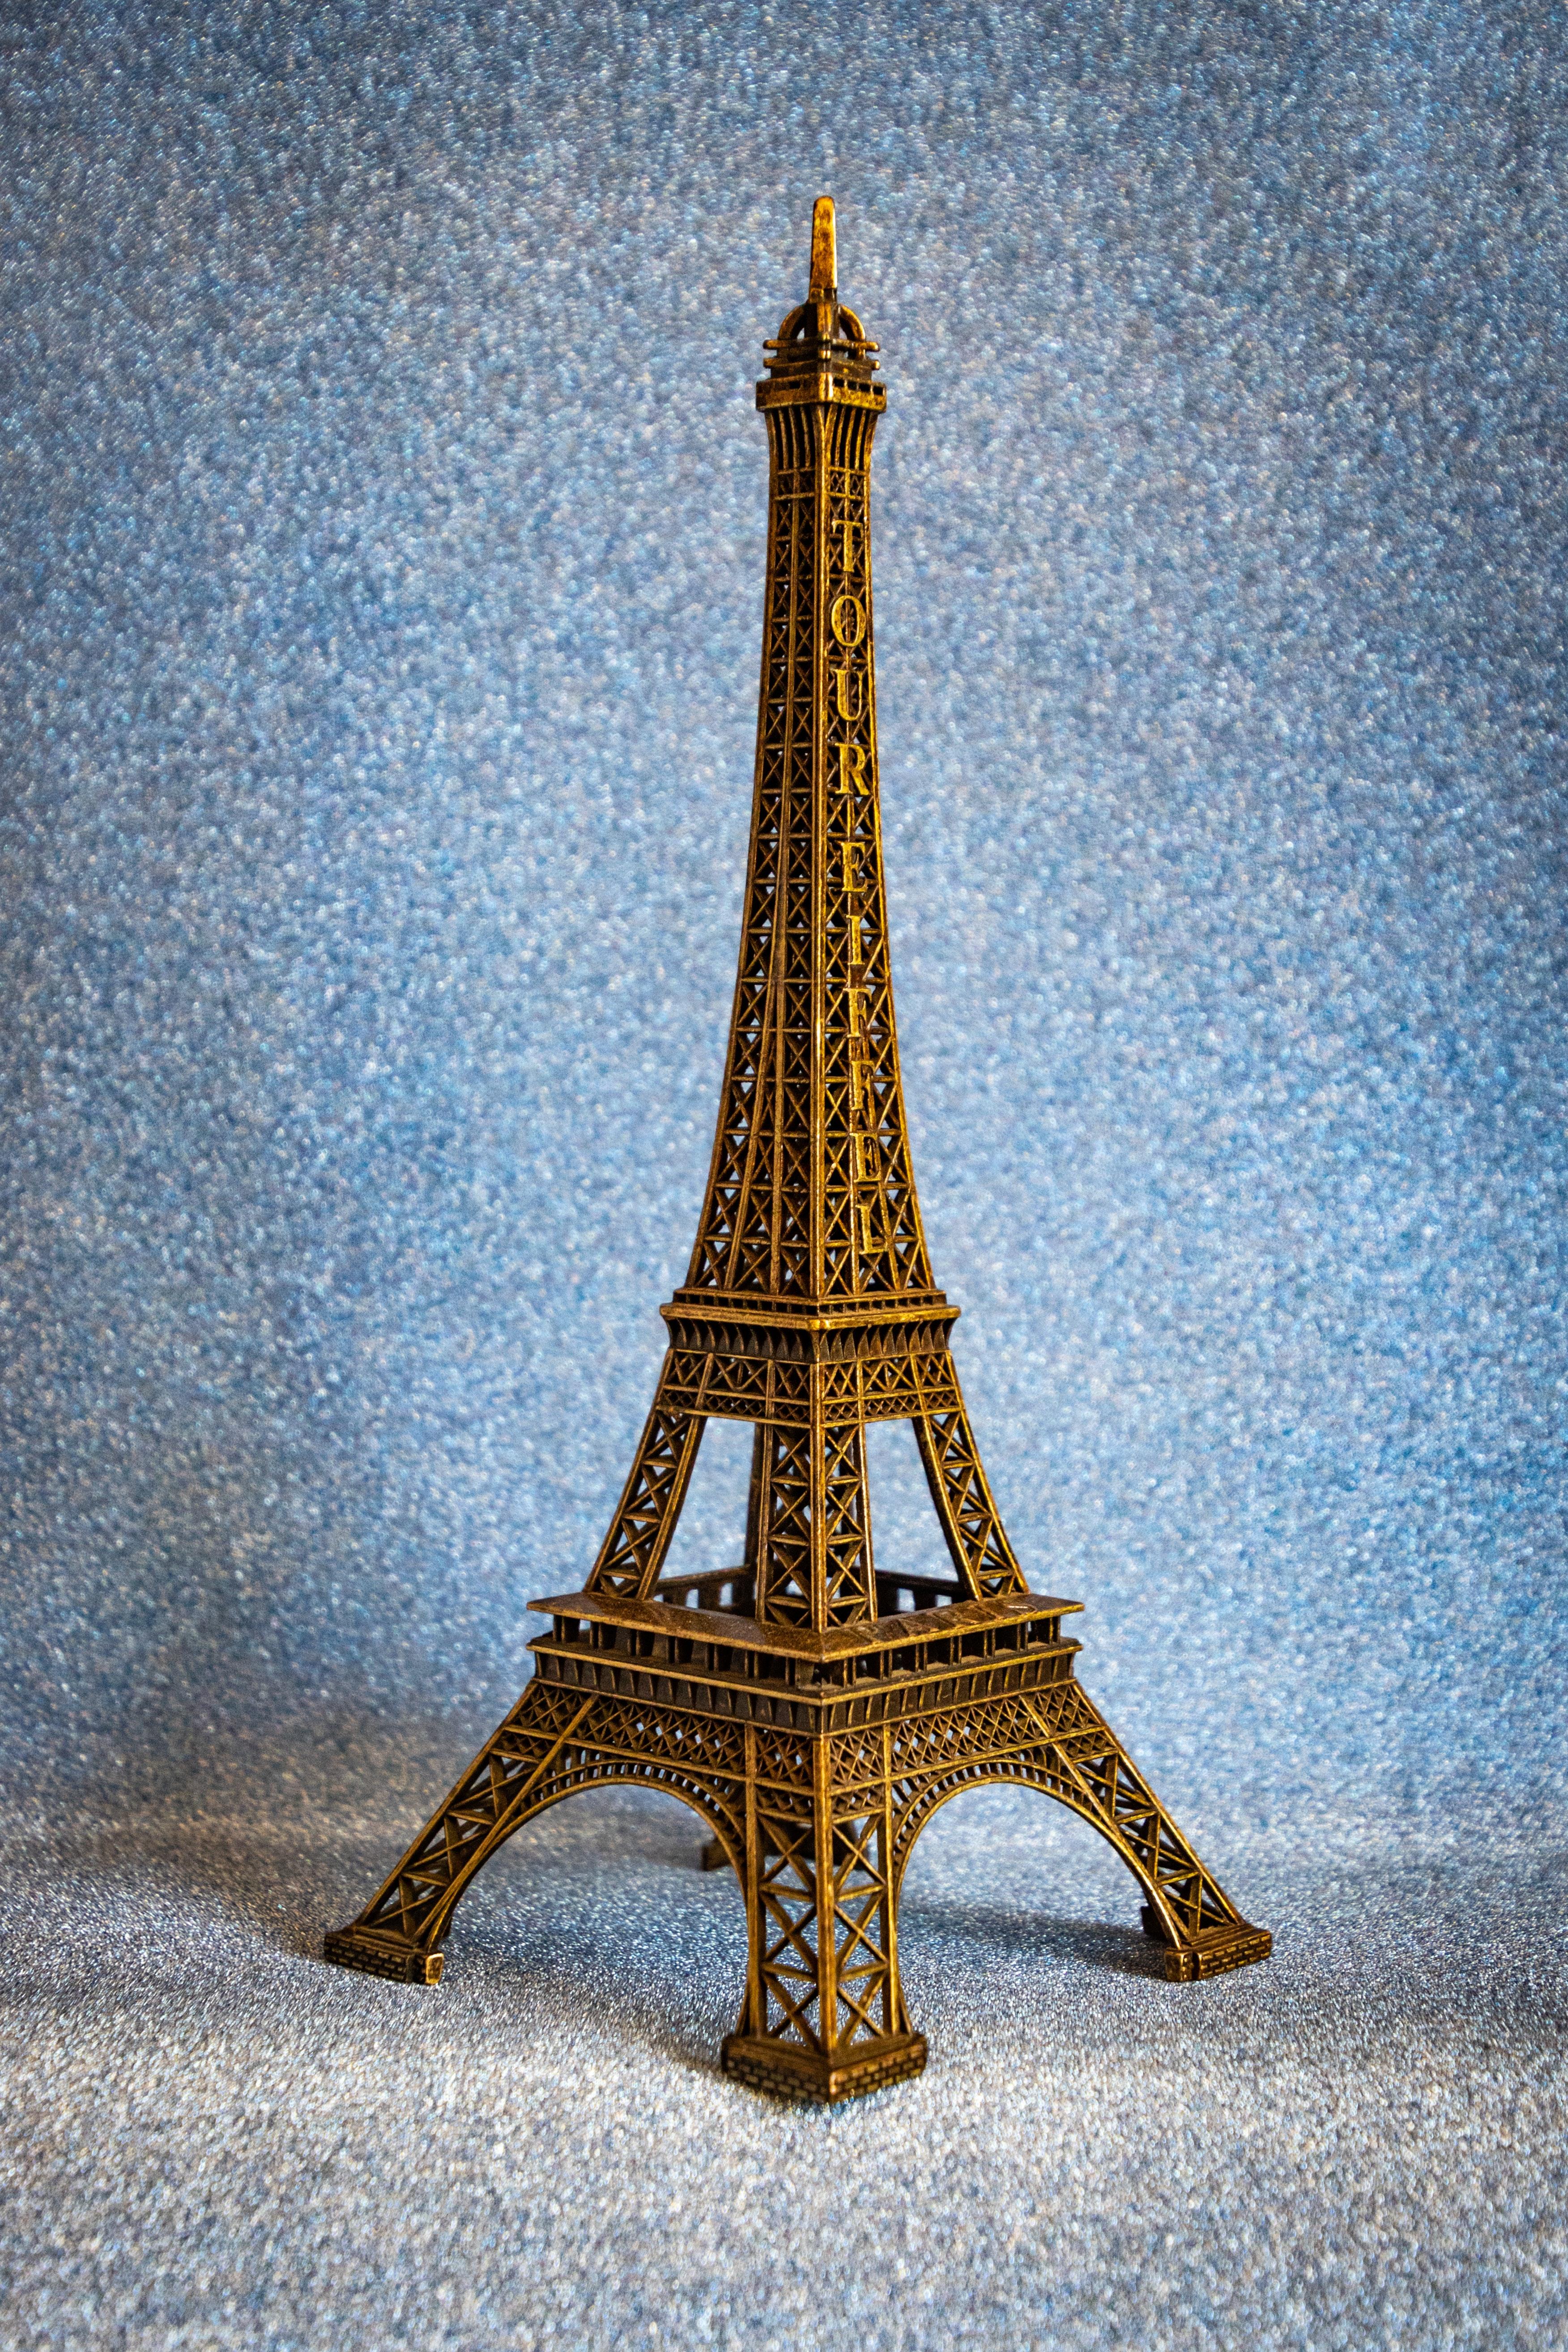 1000 Beautiful Eiffel Tower Photos Pexels Free Stock Photos